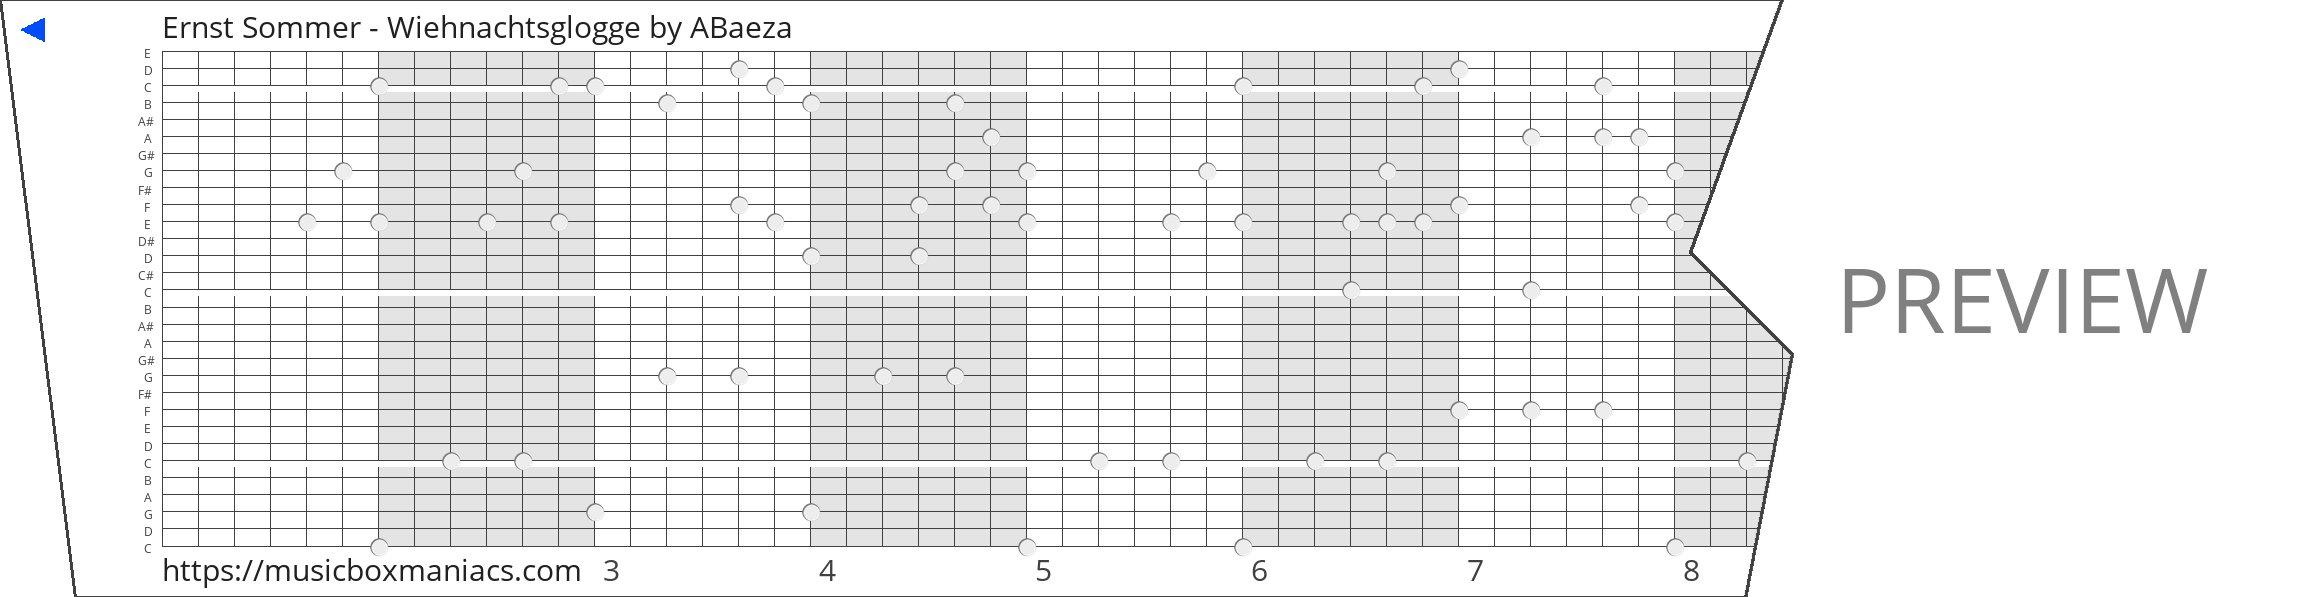 Ernst Sommer - Wiehnachtsglogge 30 note music box paper strip